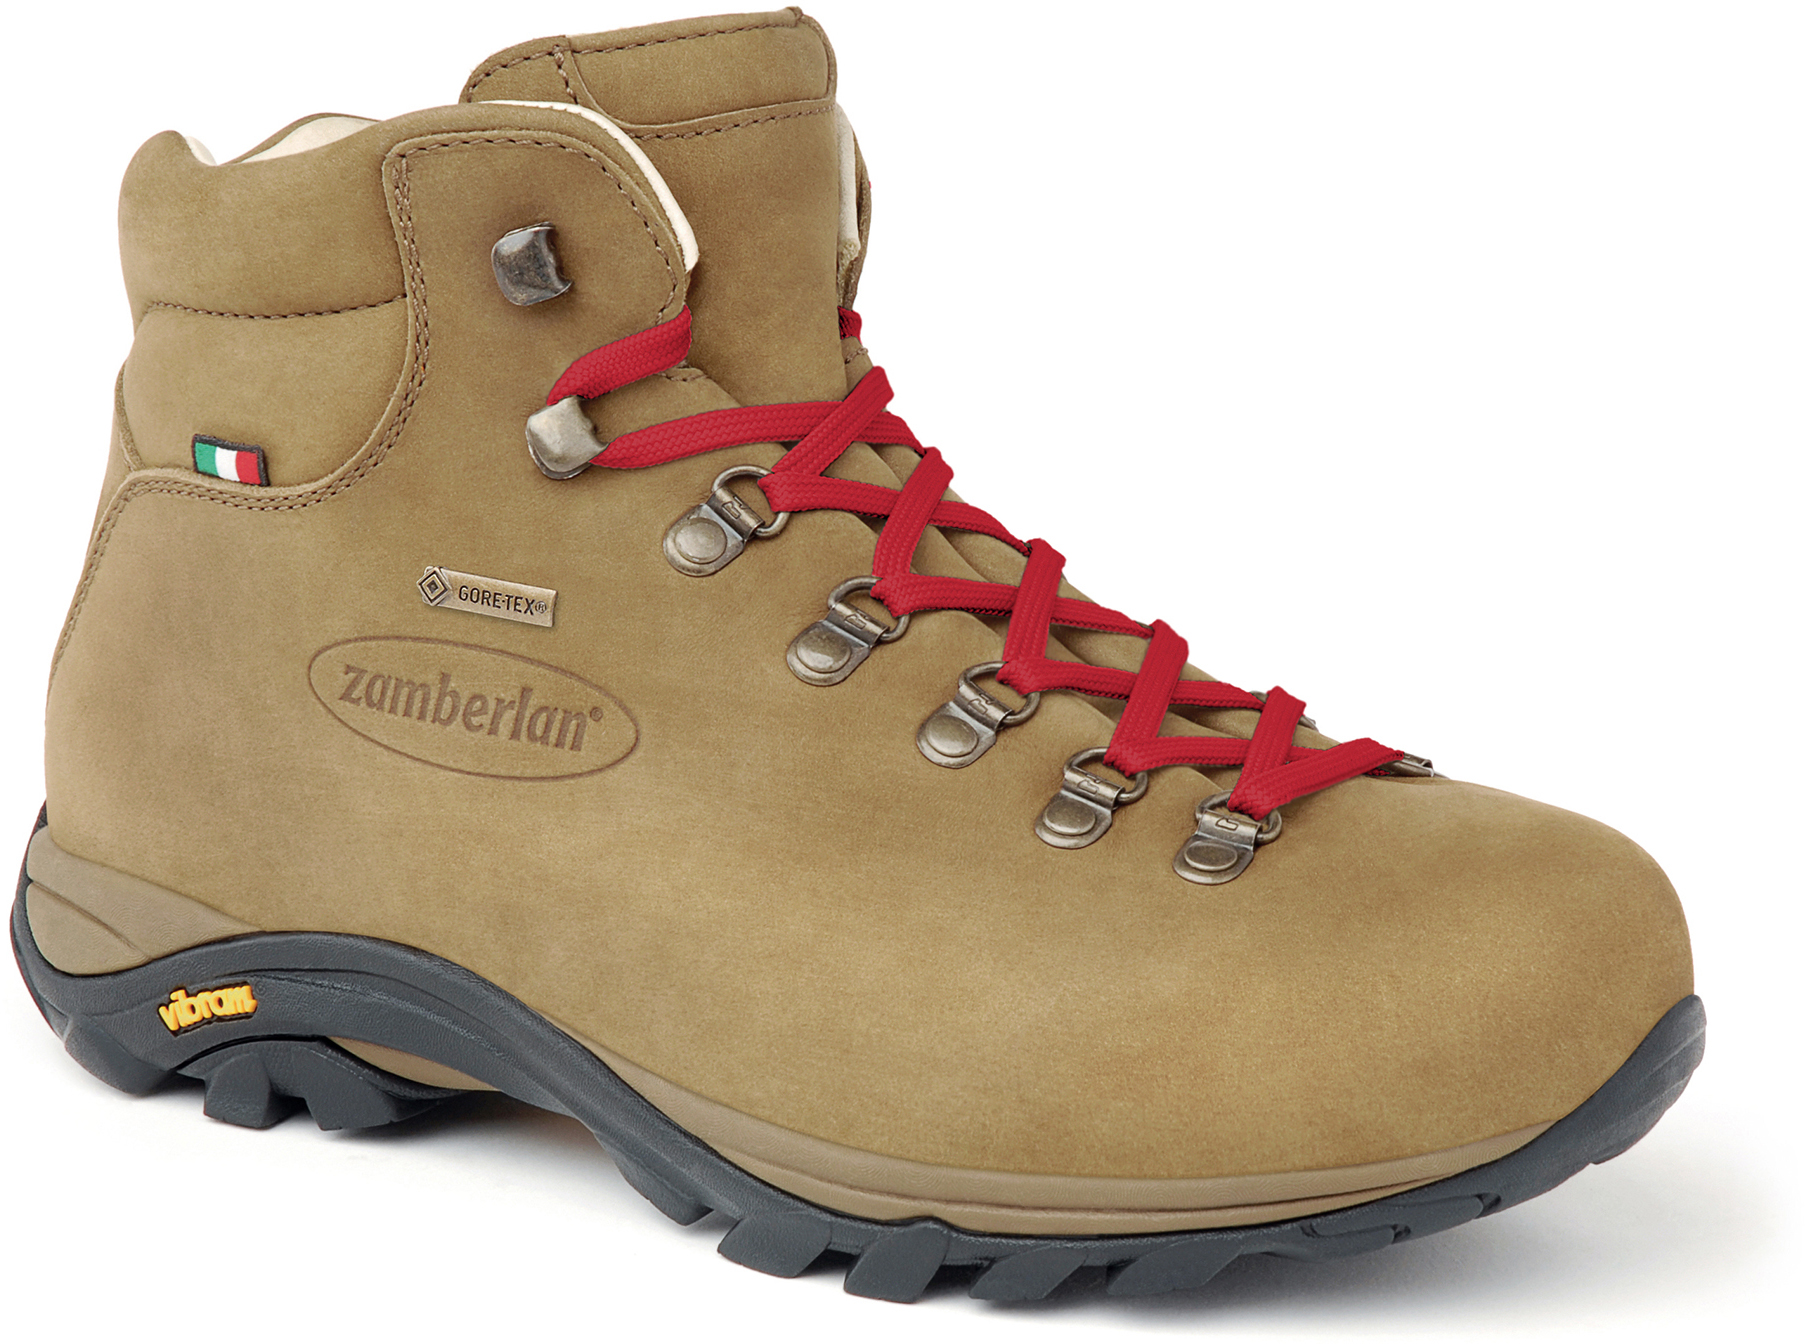 6a967863b6c Footwear | MEC